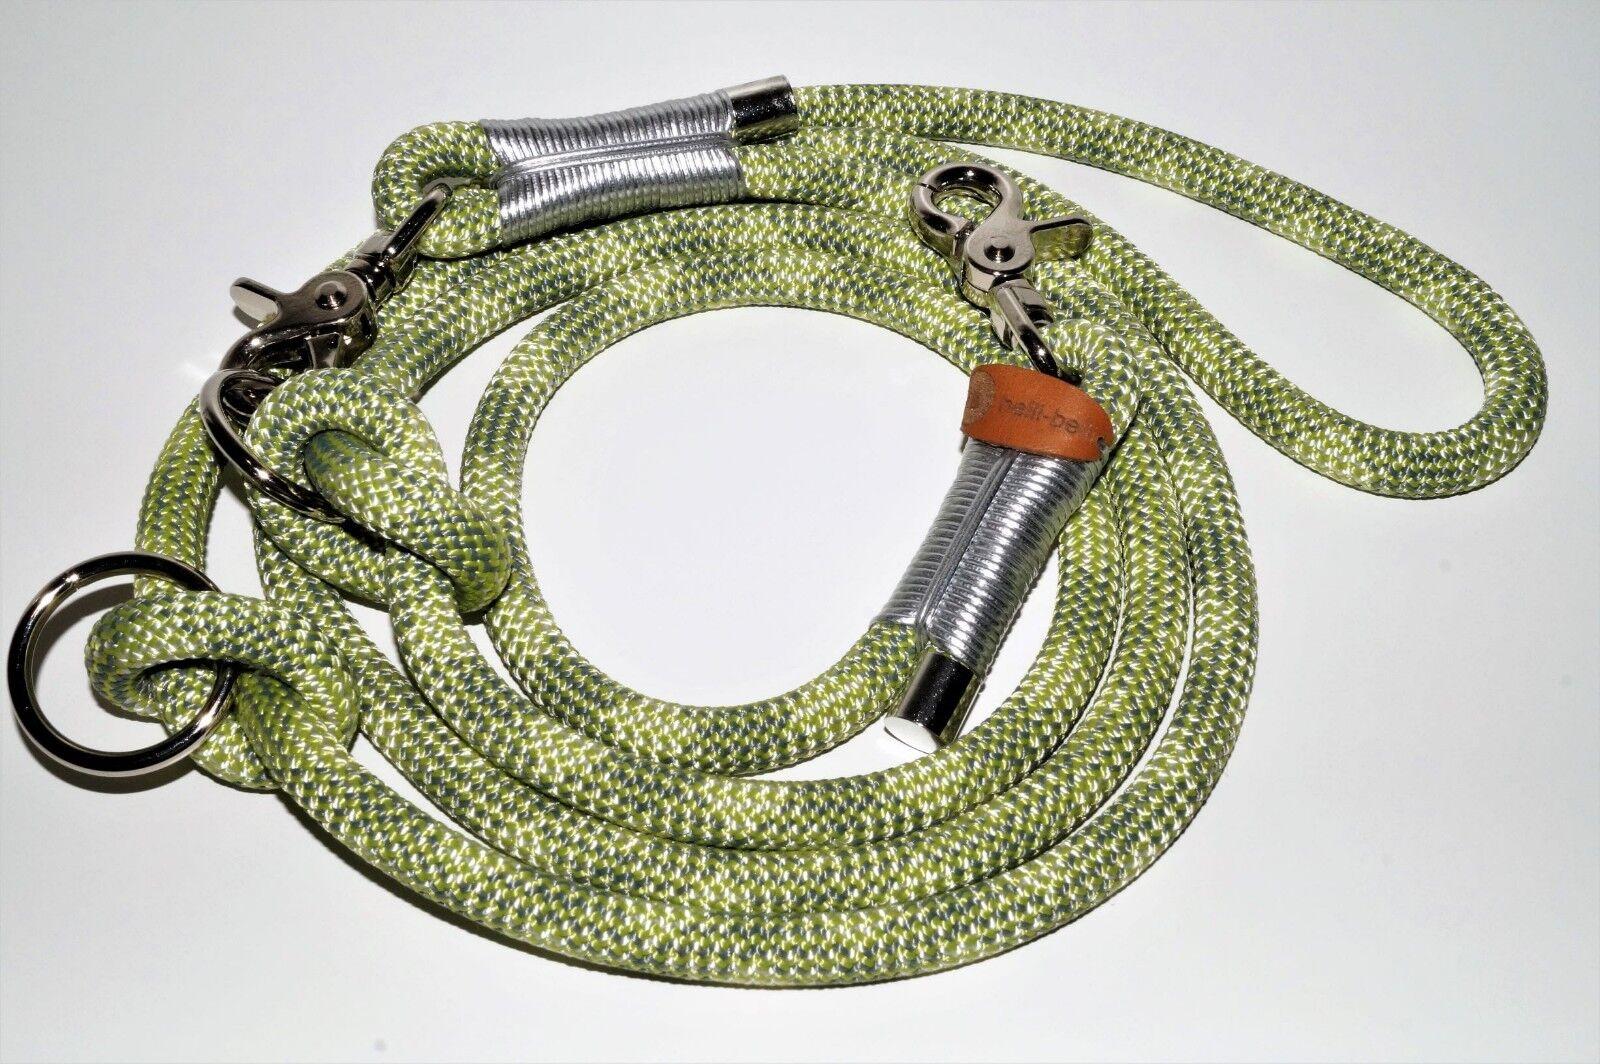 Hundeleine Seil 250cm oasis stone leder silber chrom  | Gemäßigten Kosten